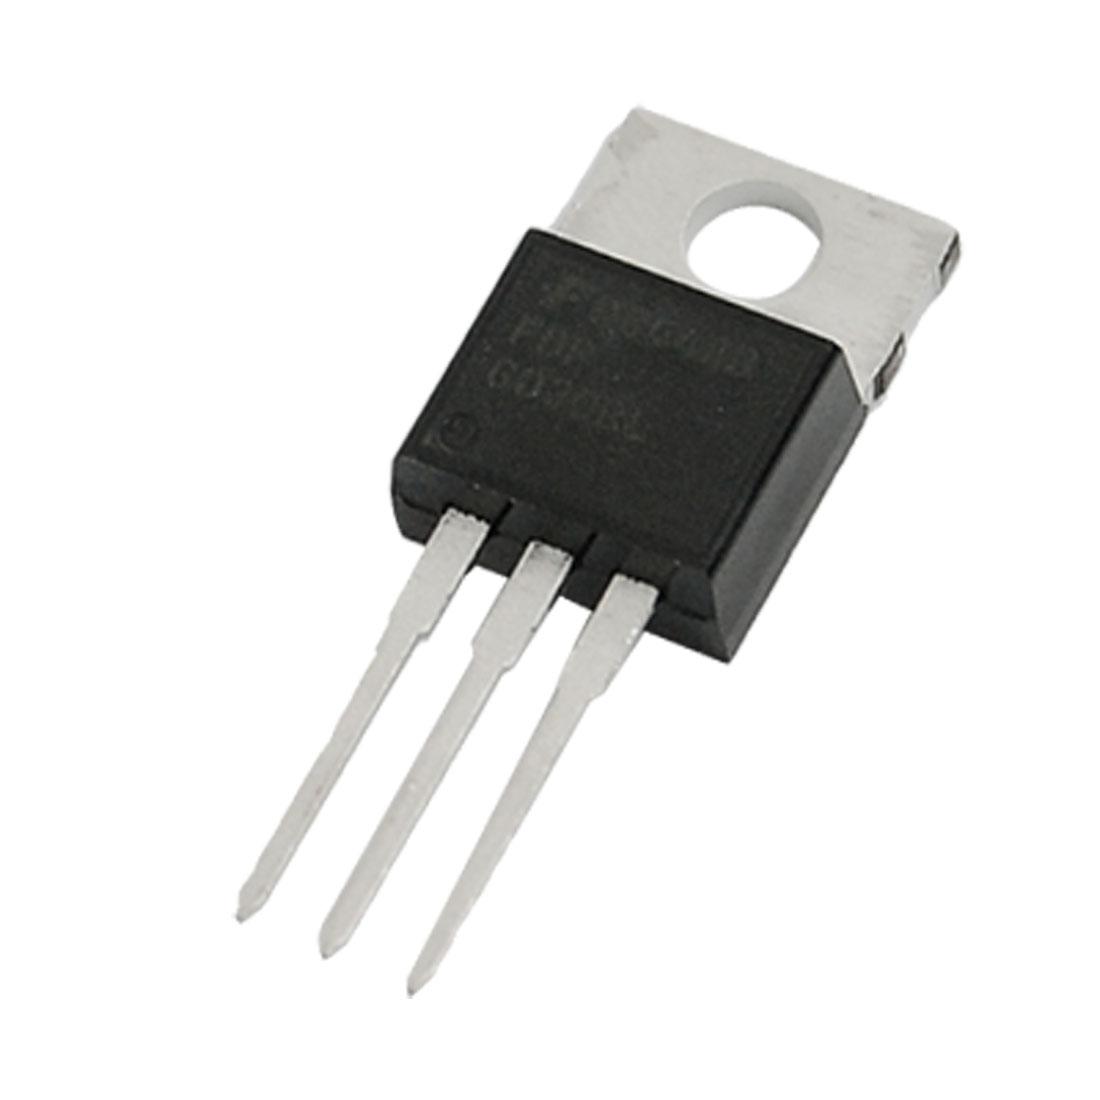 FQP6030BL 30V 60A 3 Pin Terminal Triode Transistor Switch